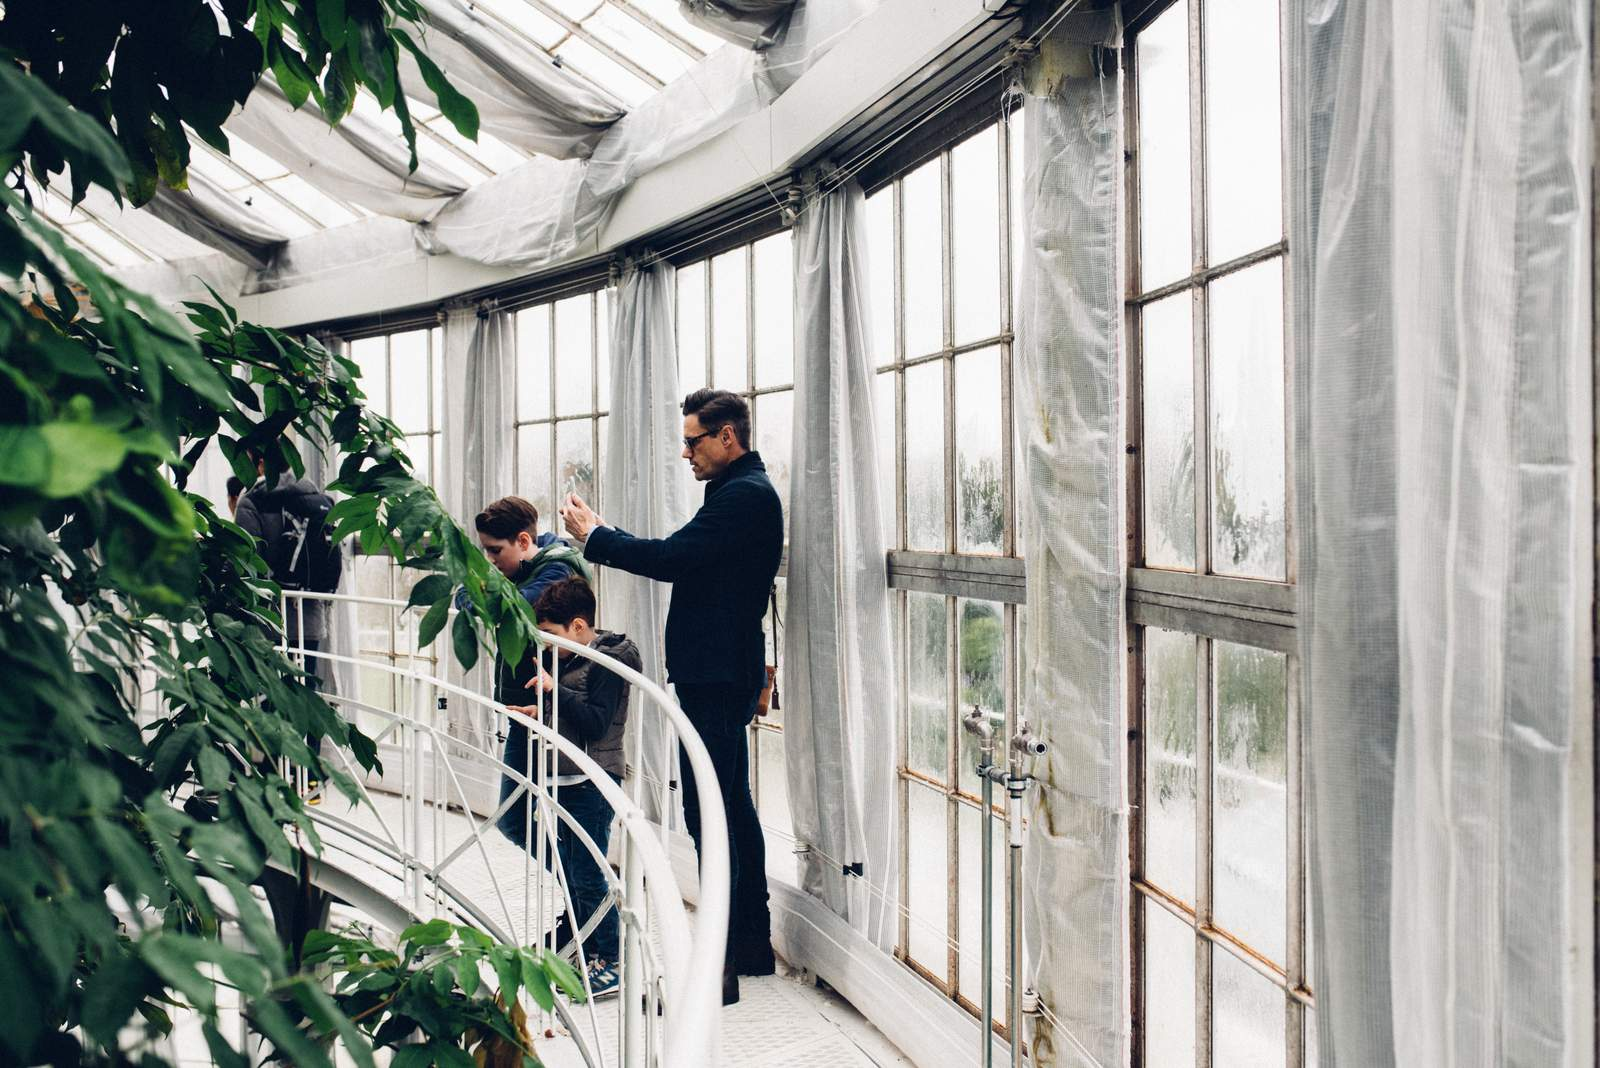 copenhagen-botanical-gardens-house-of-valentina-24